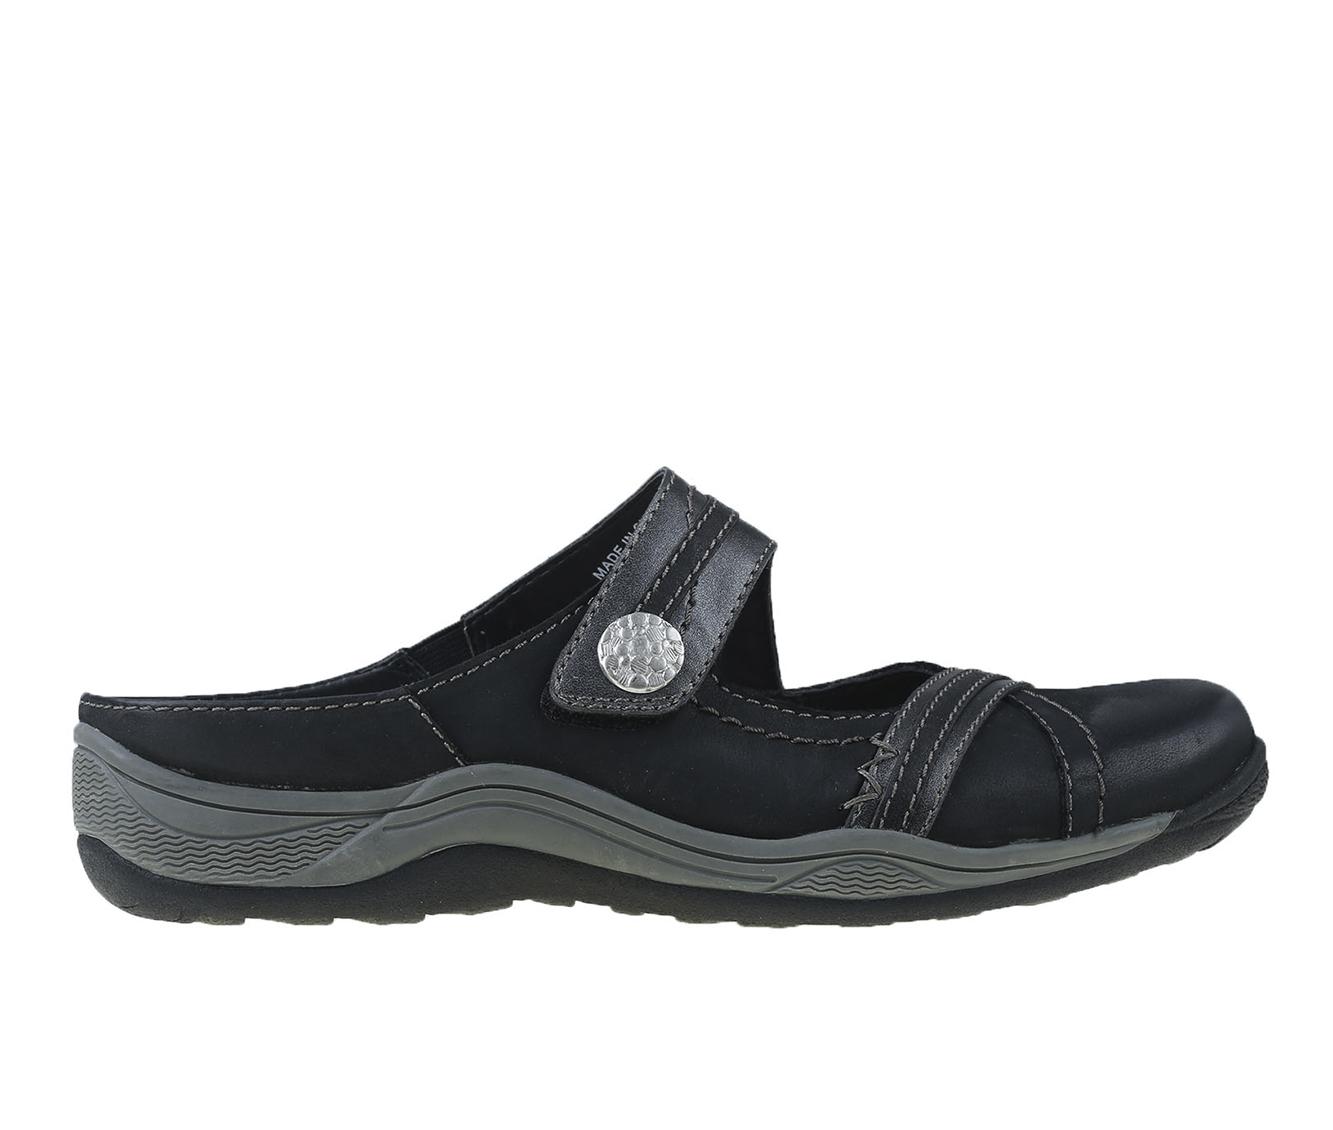 Earth Origins Clara Chloe Women's Shoe (Black Leather)